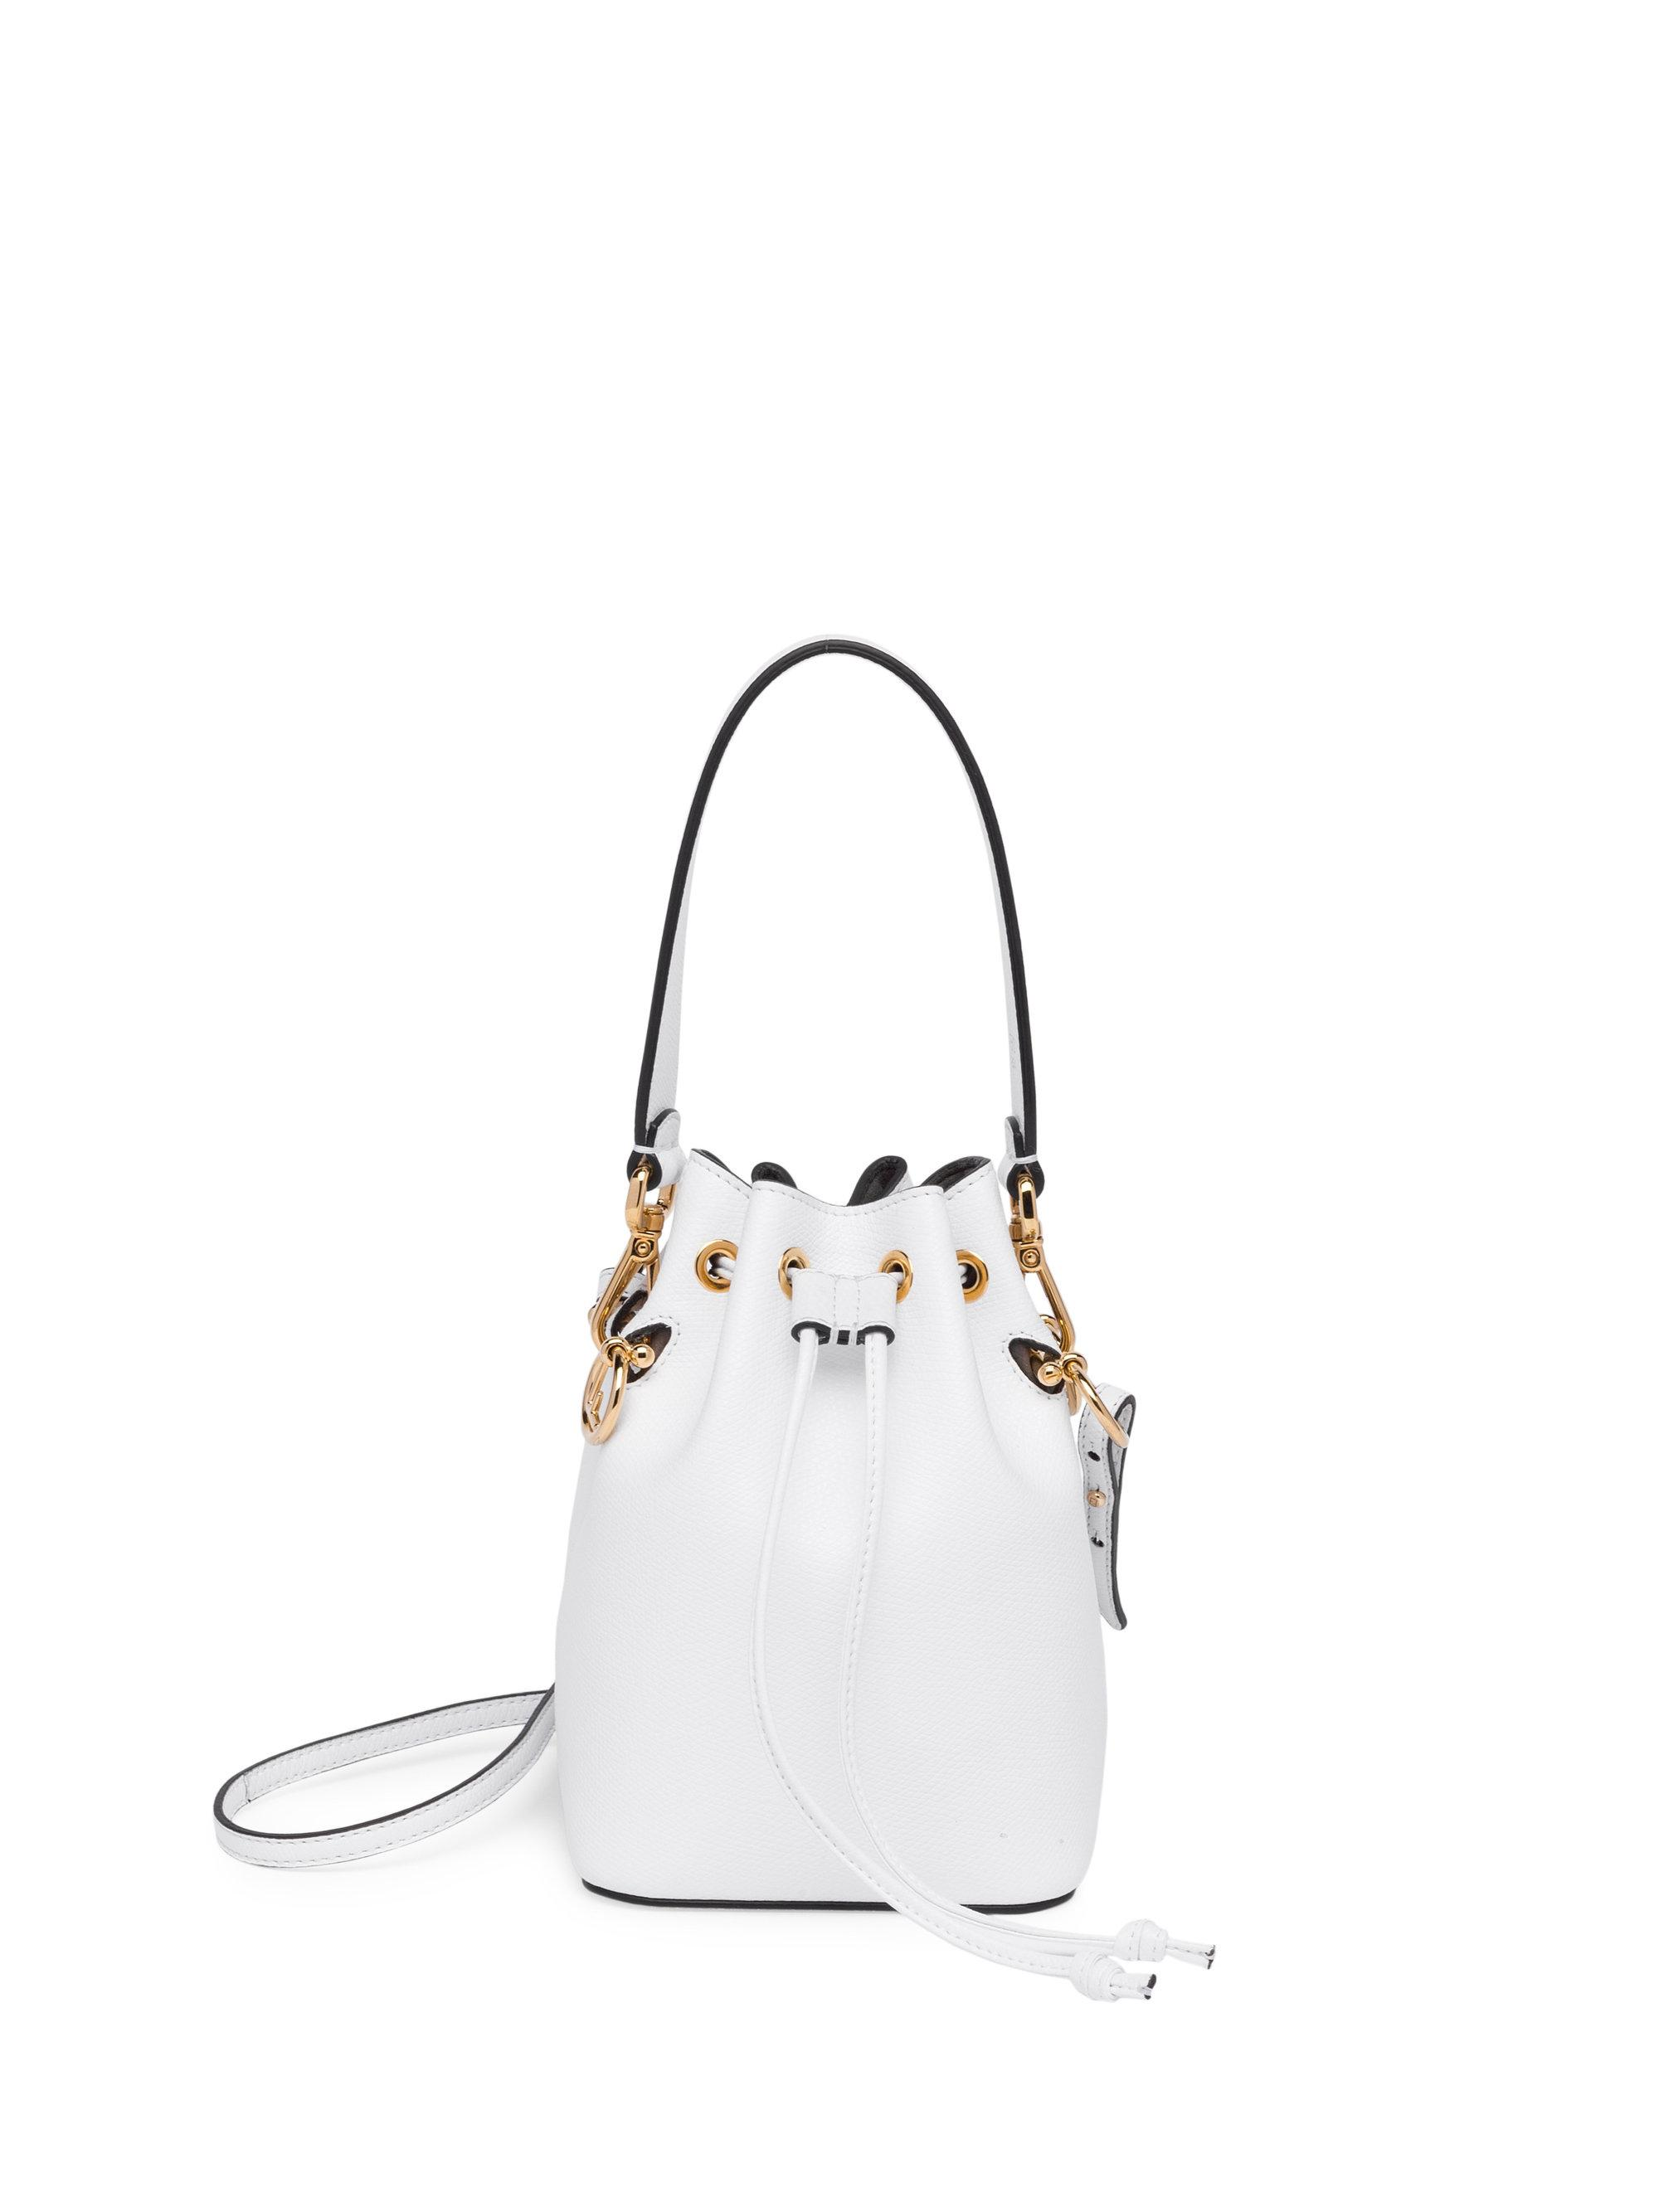 f51d26a4d80 Lyst - Fendi Mon Tresor Leather Bucket Bag in White